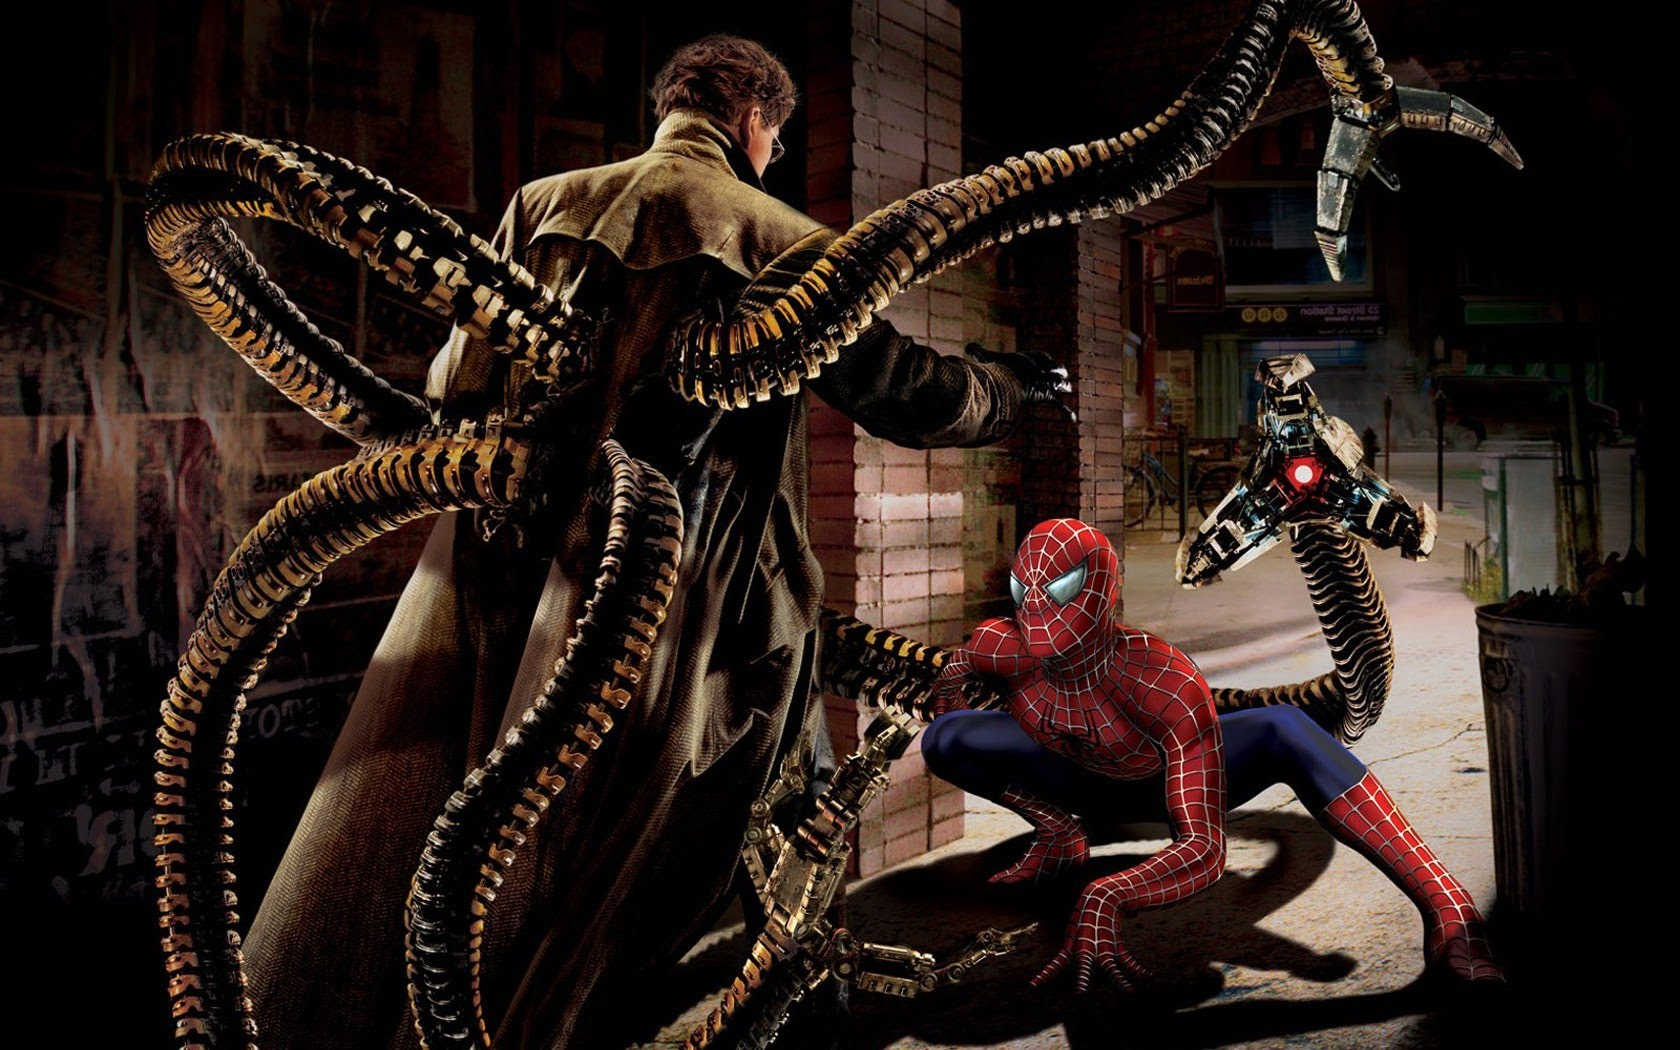 (Spiderman 2 (2004